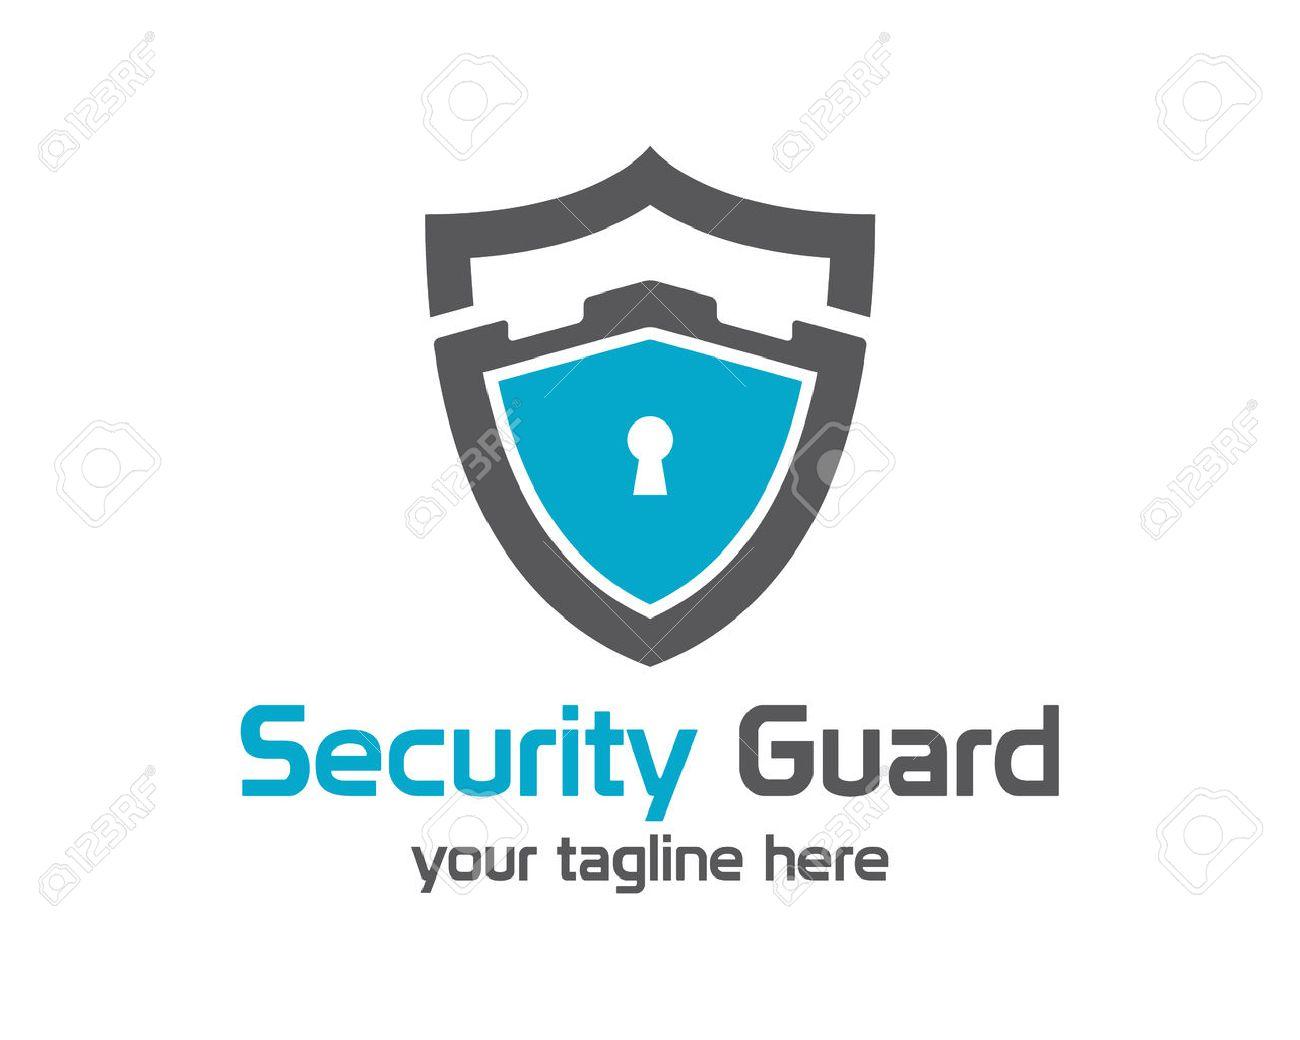 Security guard logo design vector. Security protection shield symbol . Secure shield icon vector. Privacy lock icon . - 41503743